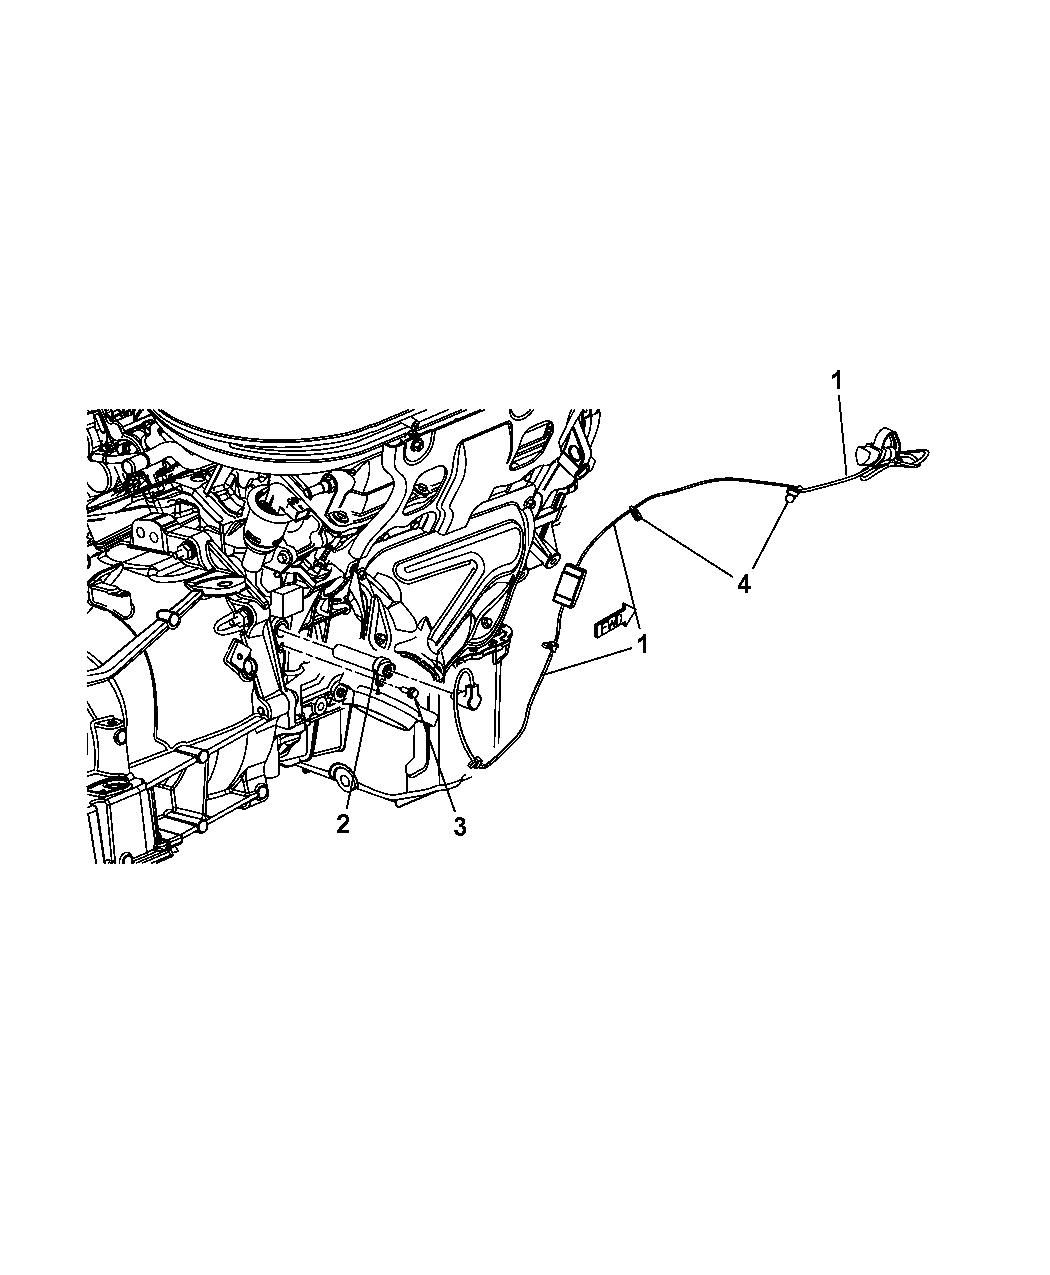 jeep wrangler heater diagram 2015 jeep wrangler engine cylinder block heater 2000 jeep wrangler heater wiring diagram 2015 jeep wrangler engine cylinder